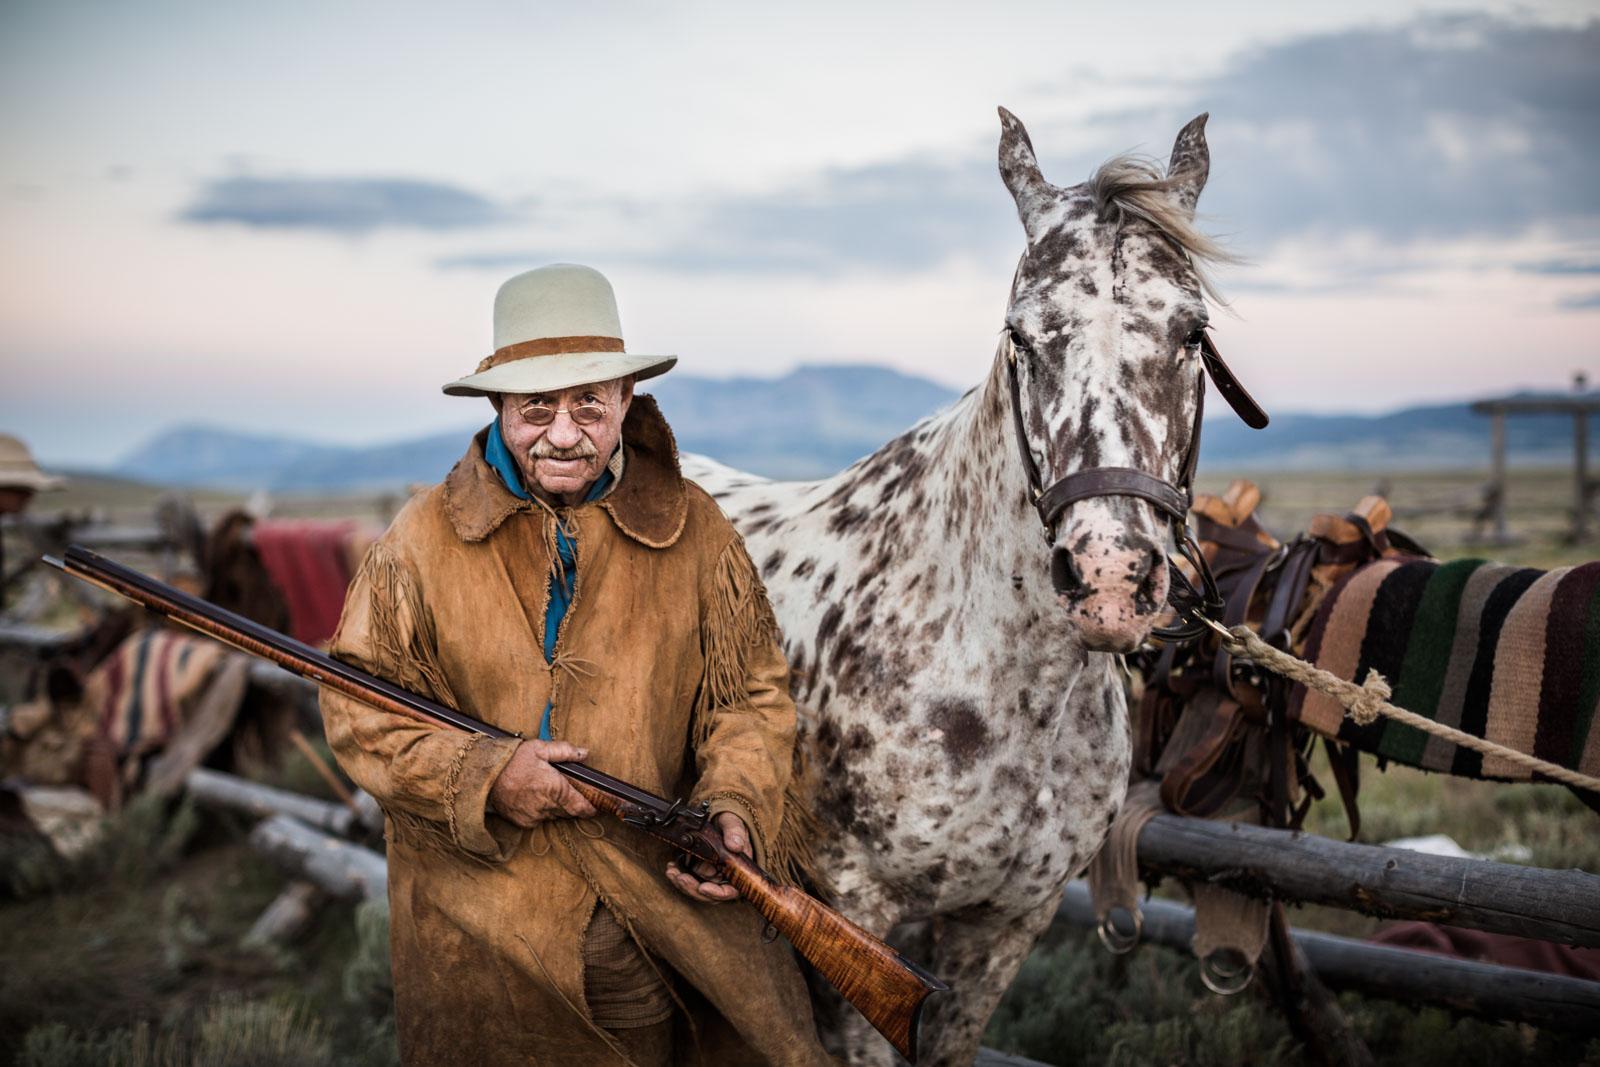 Award winning portrait photographer, Montana, USA - Prisbelönt porträttfotograf, Sverige, Sweden